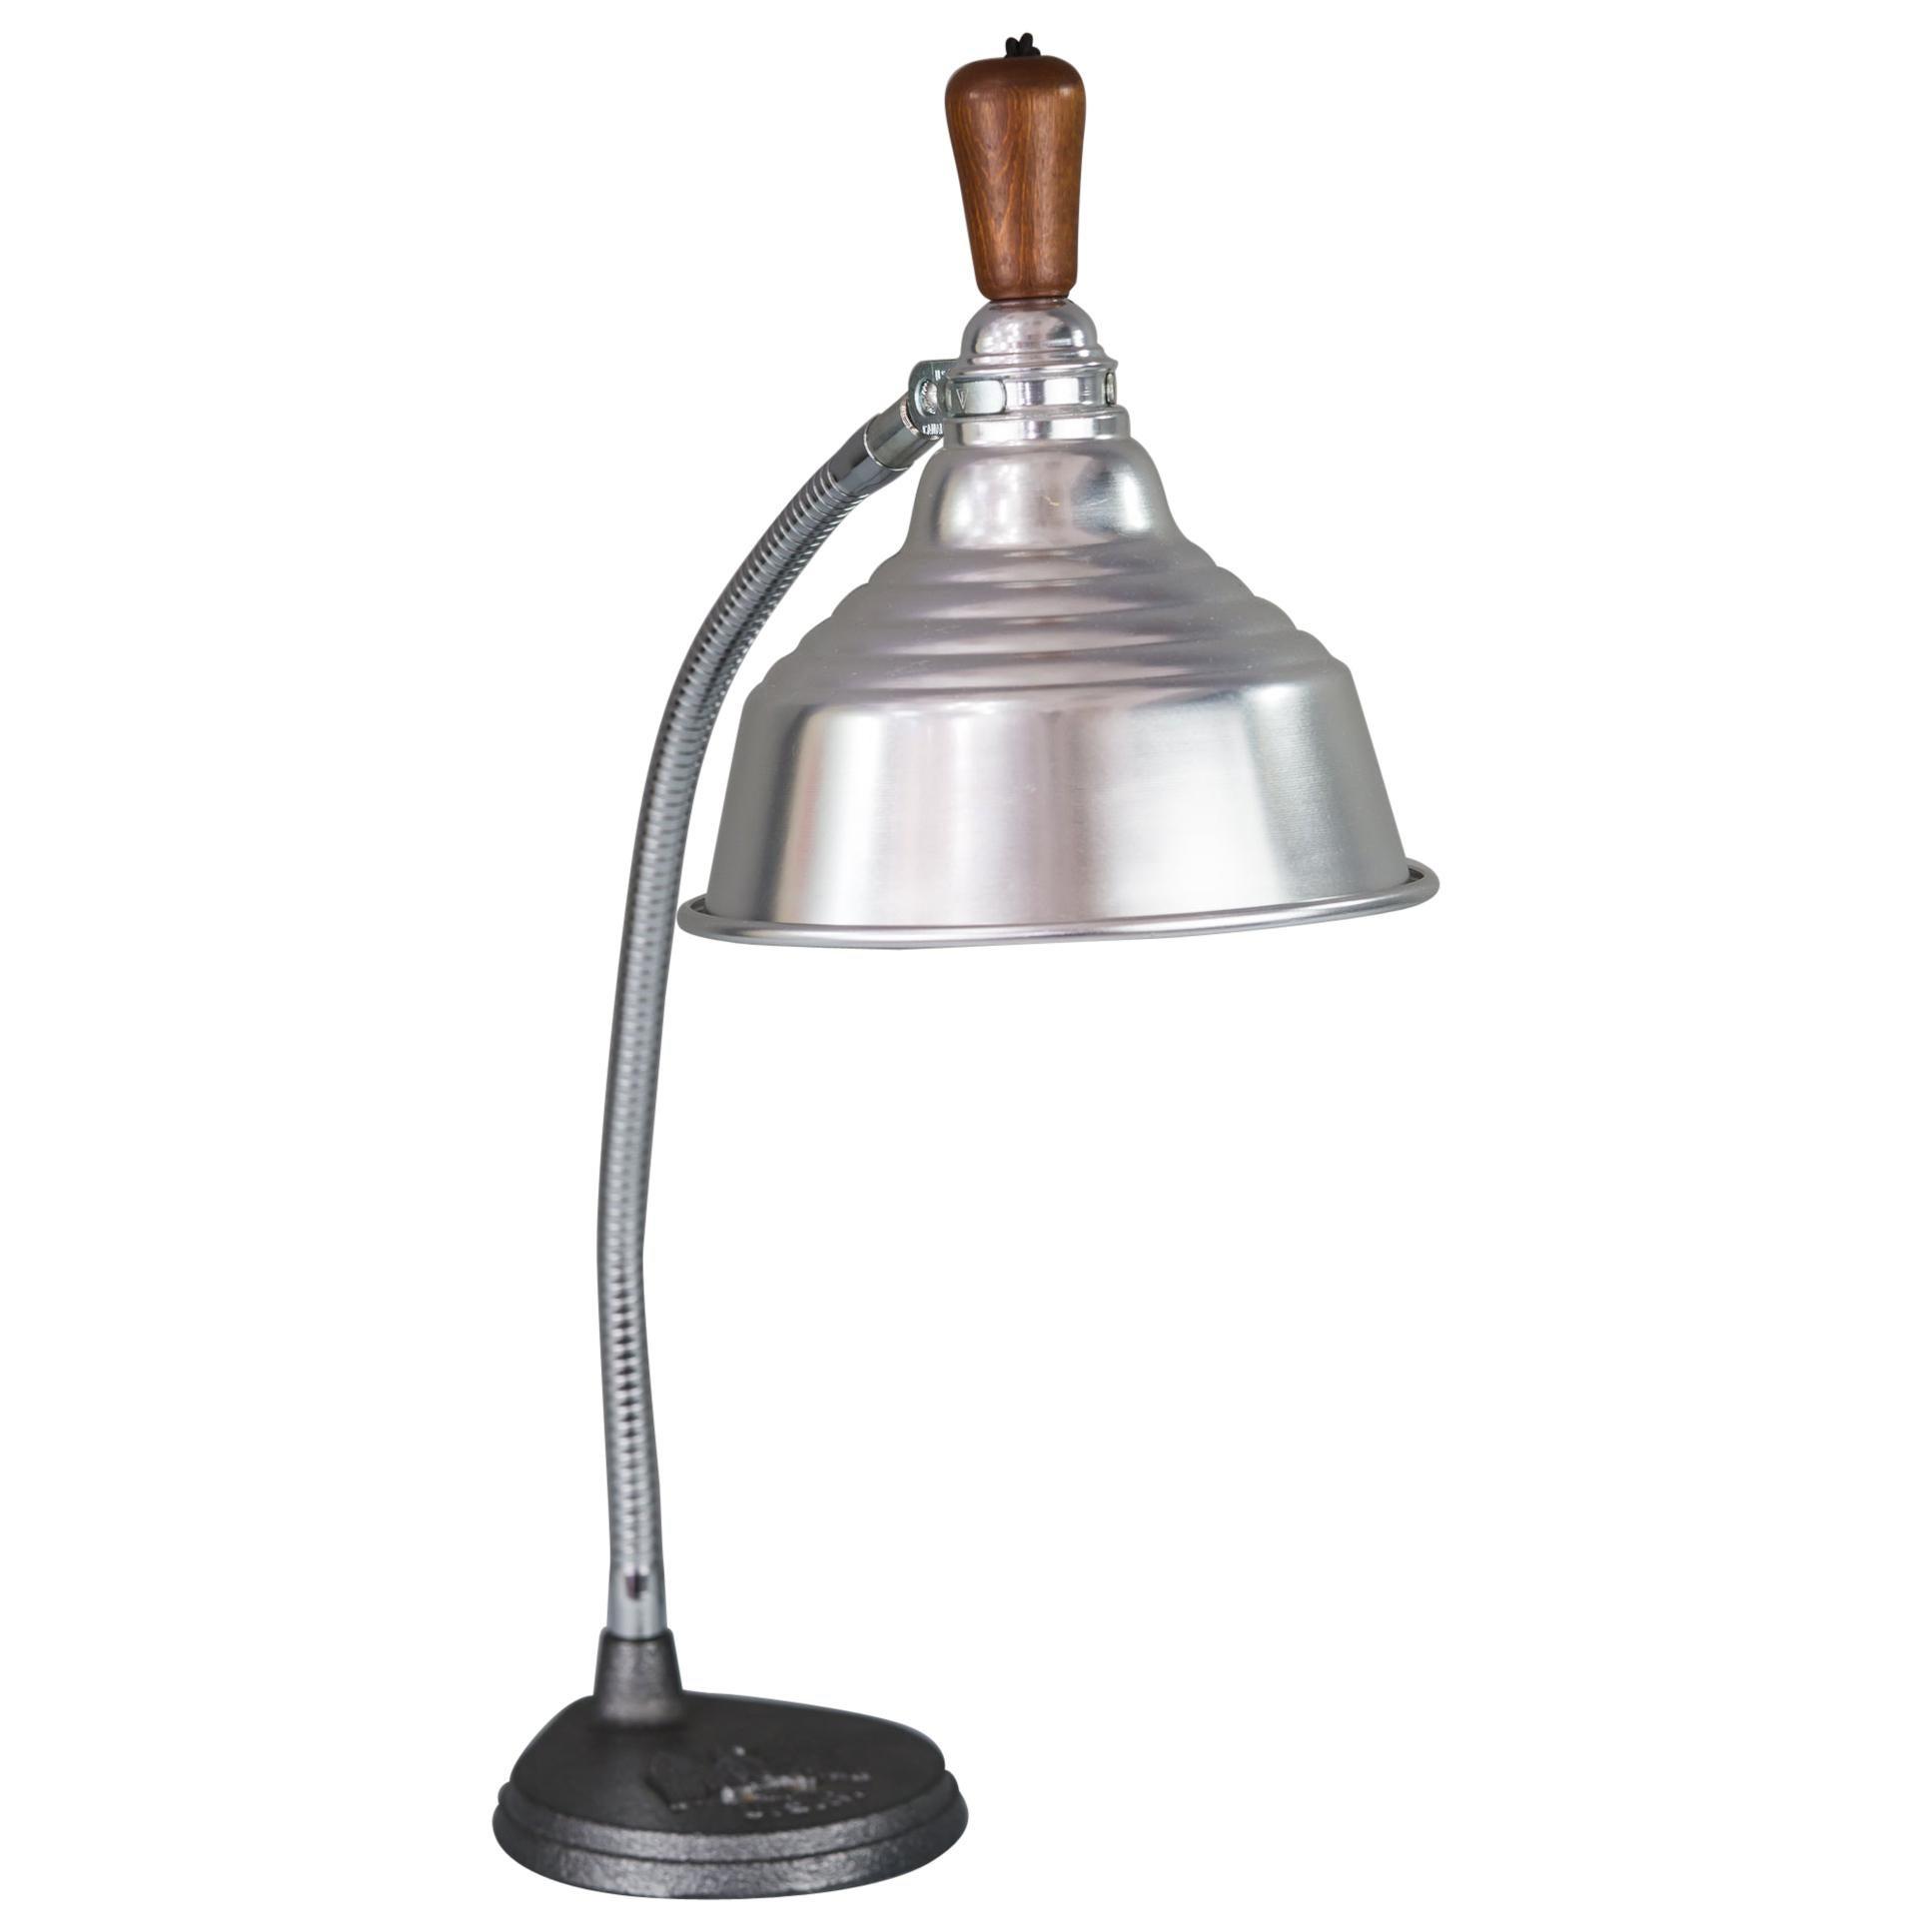 USA Table Lamp, circa 1940s